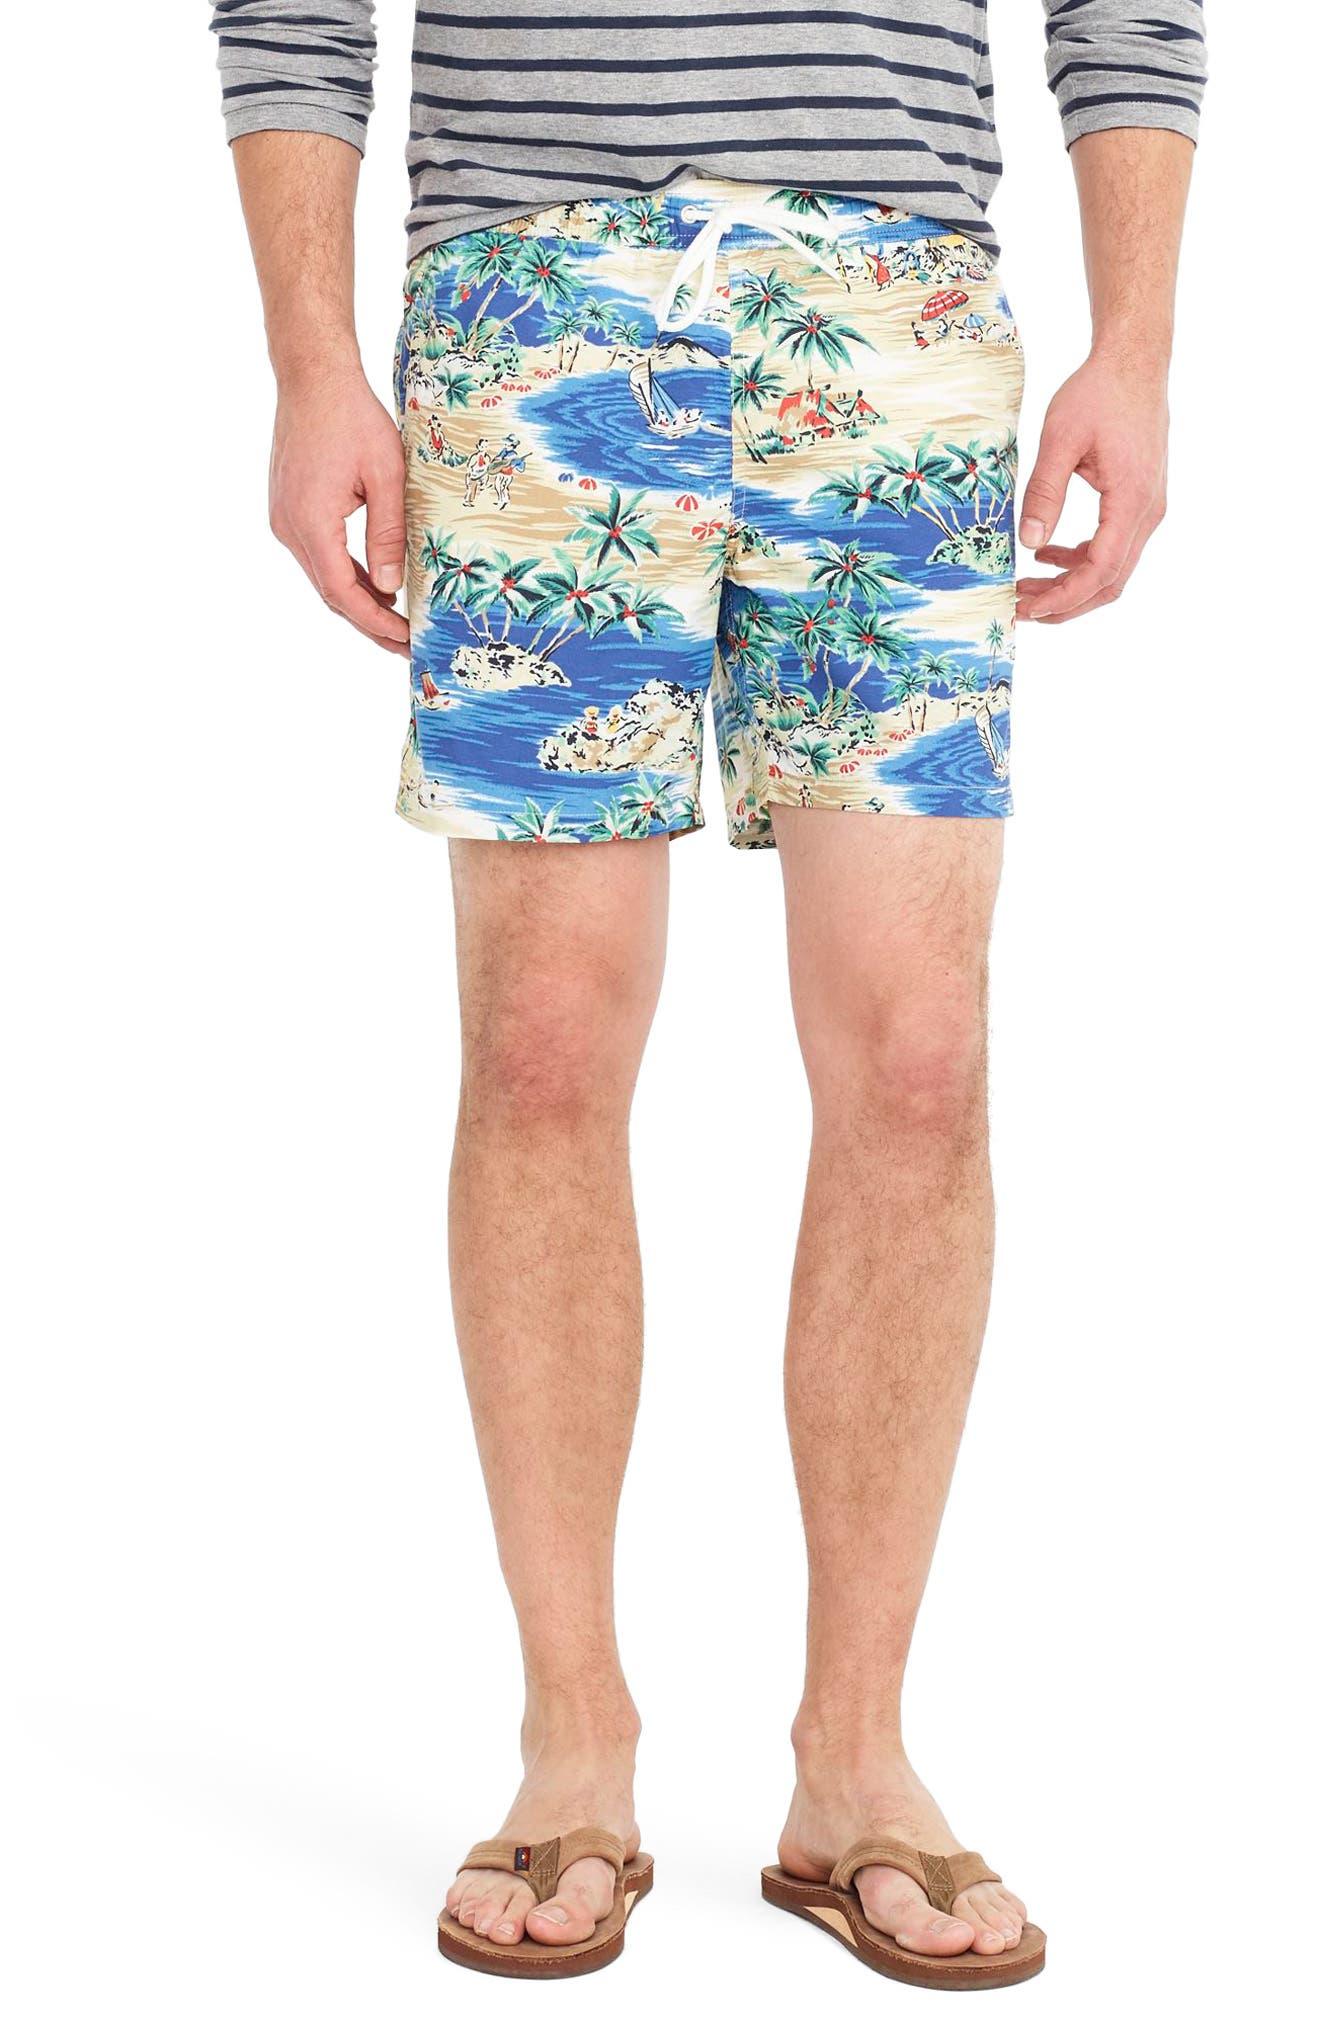 J.Crew Island Print Swim Trunks,                         Main,                         color, Moody Lagoon